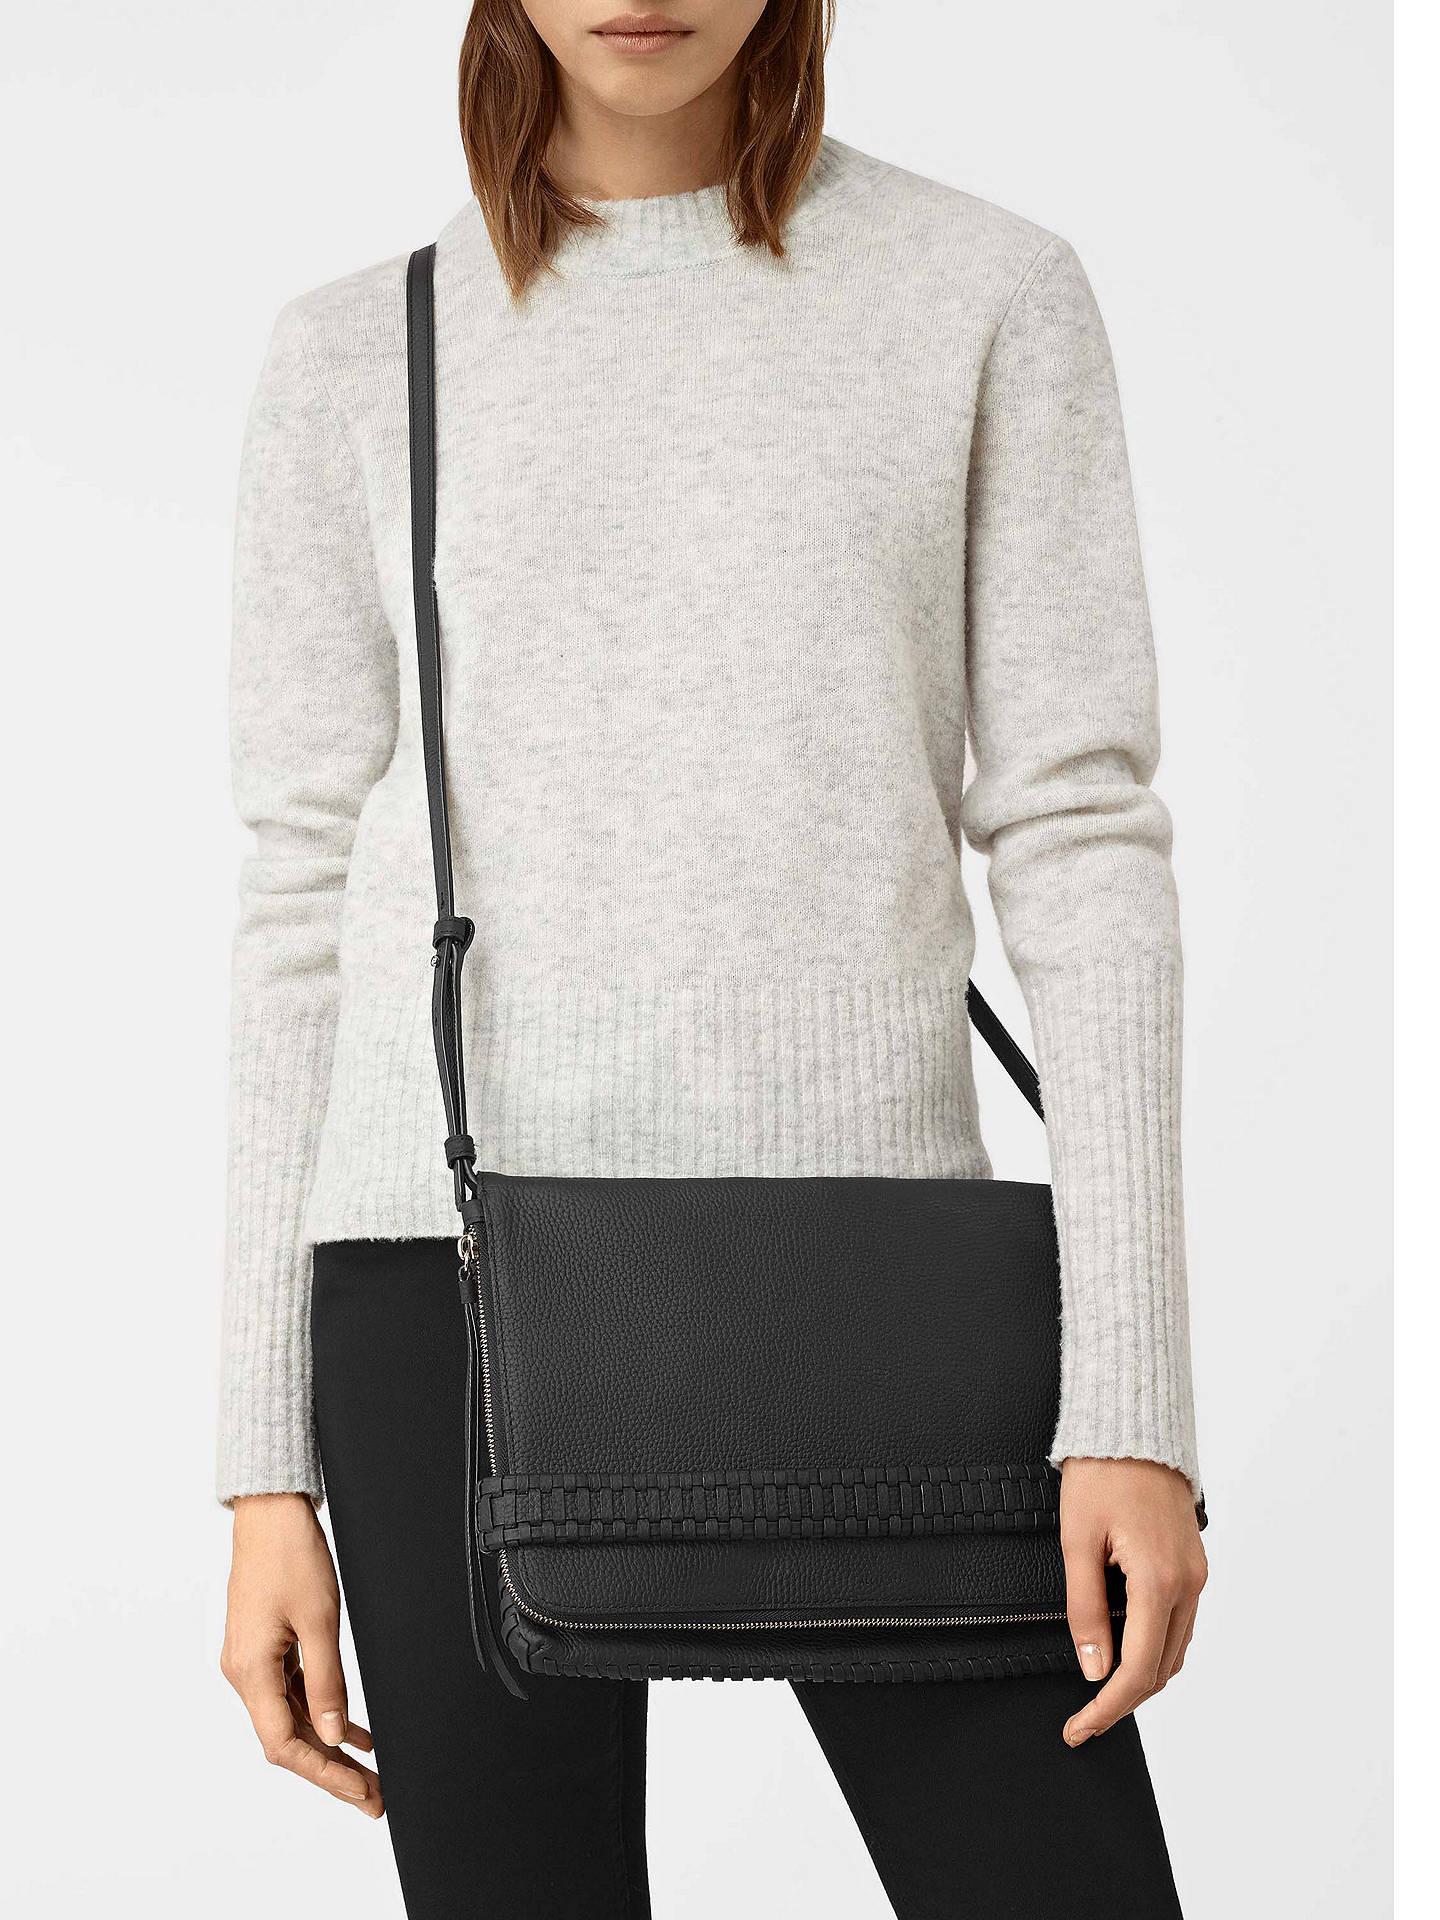 66cc899b1a ... Buy AllSaints Club Large Clutch Bag, Black Online at johnlewis.com